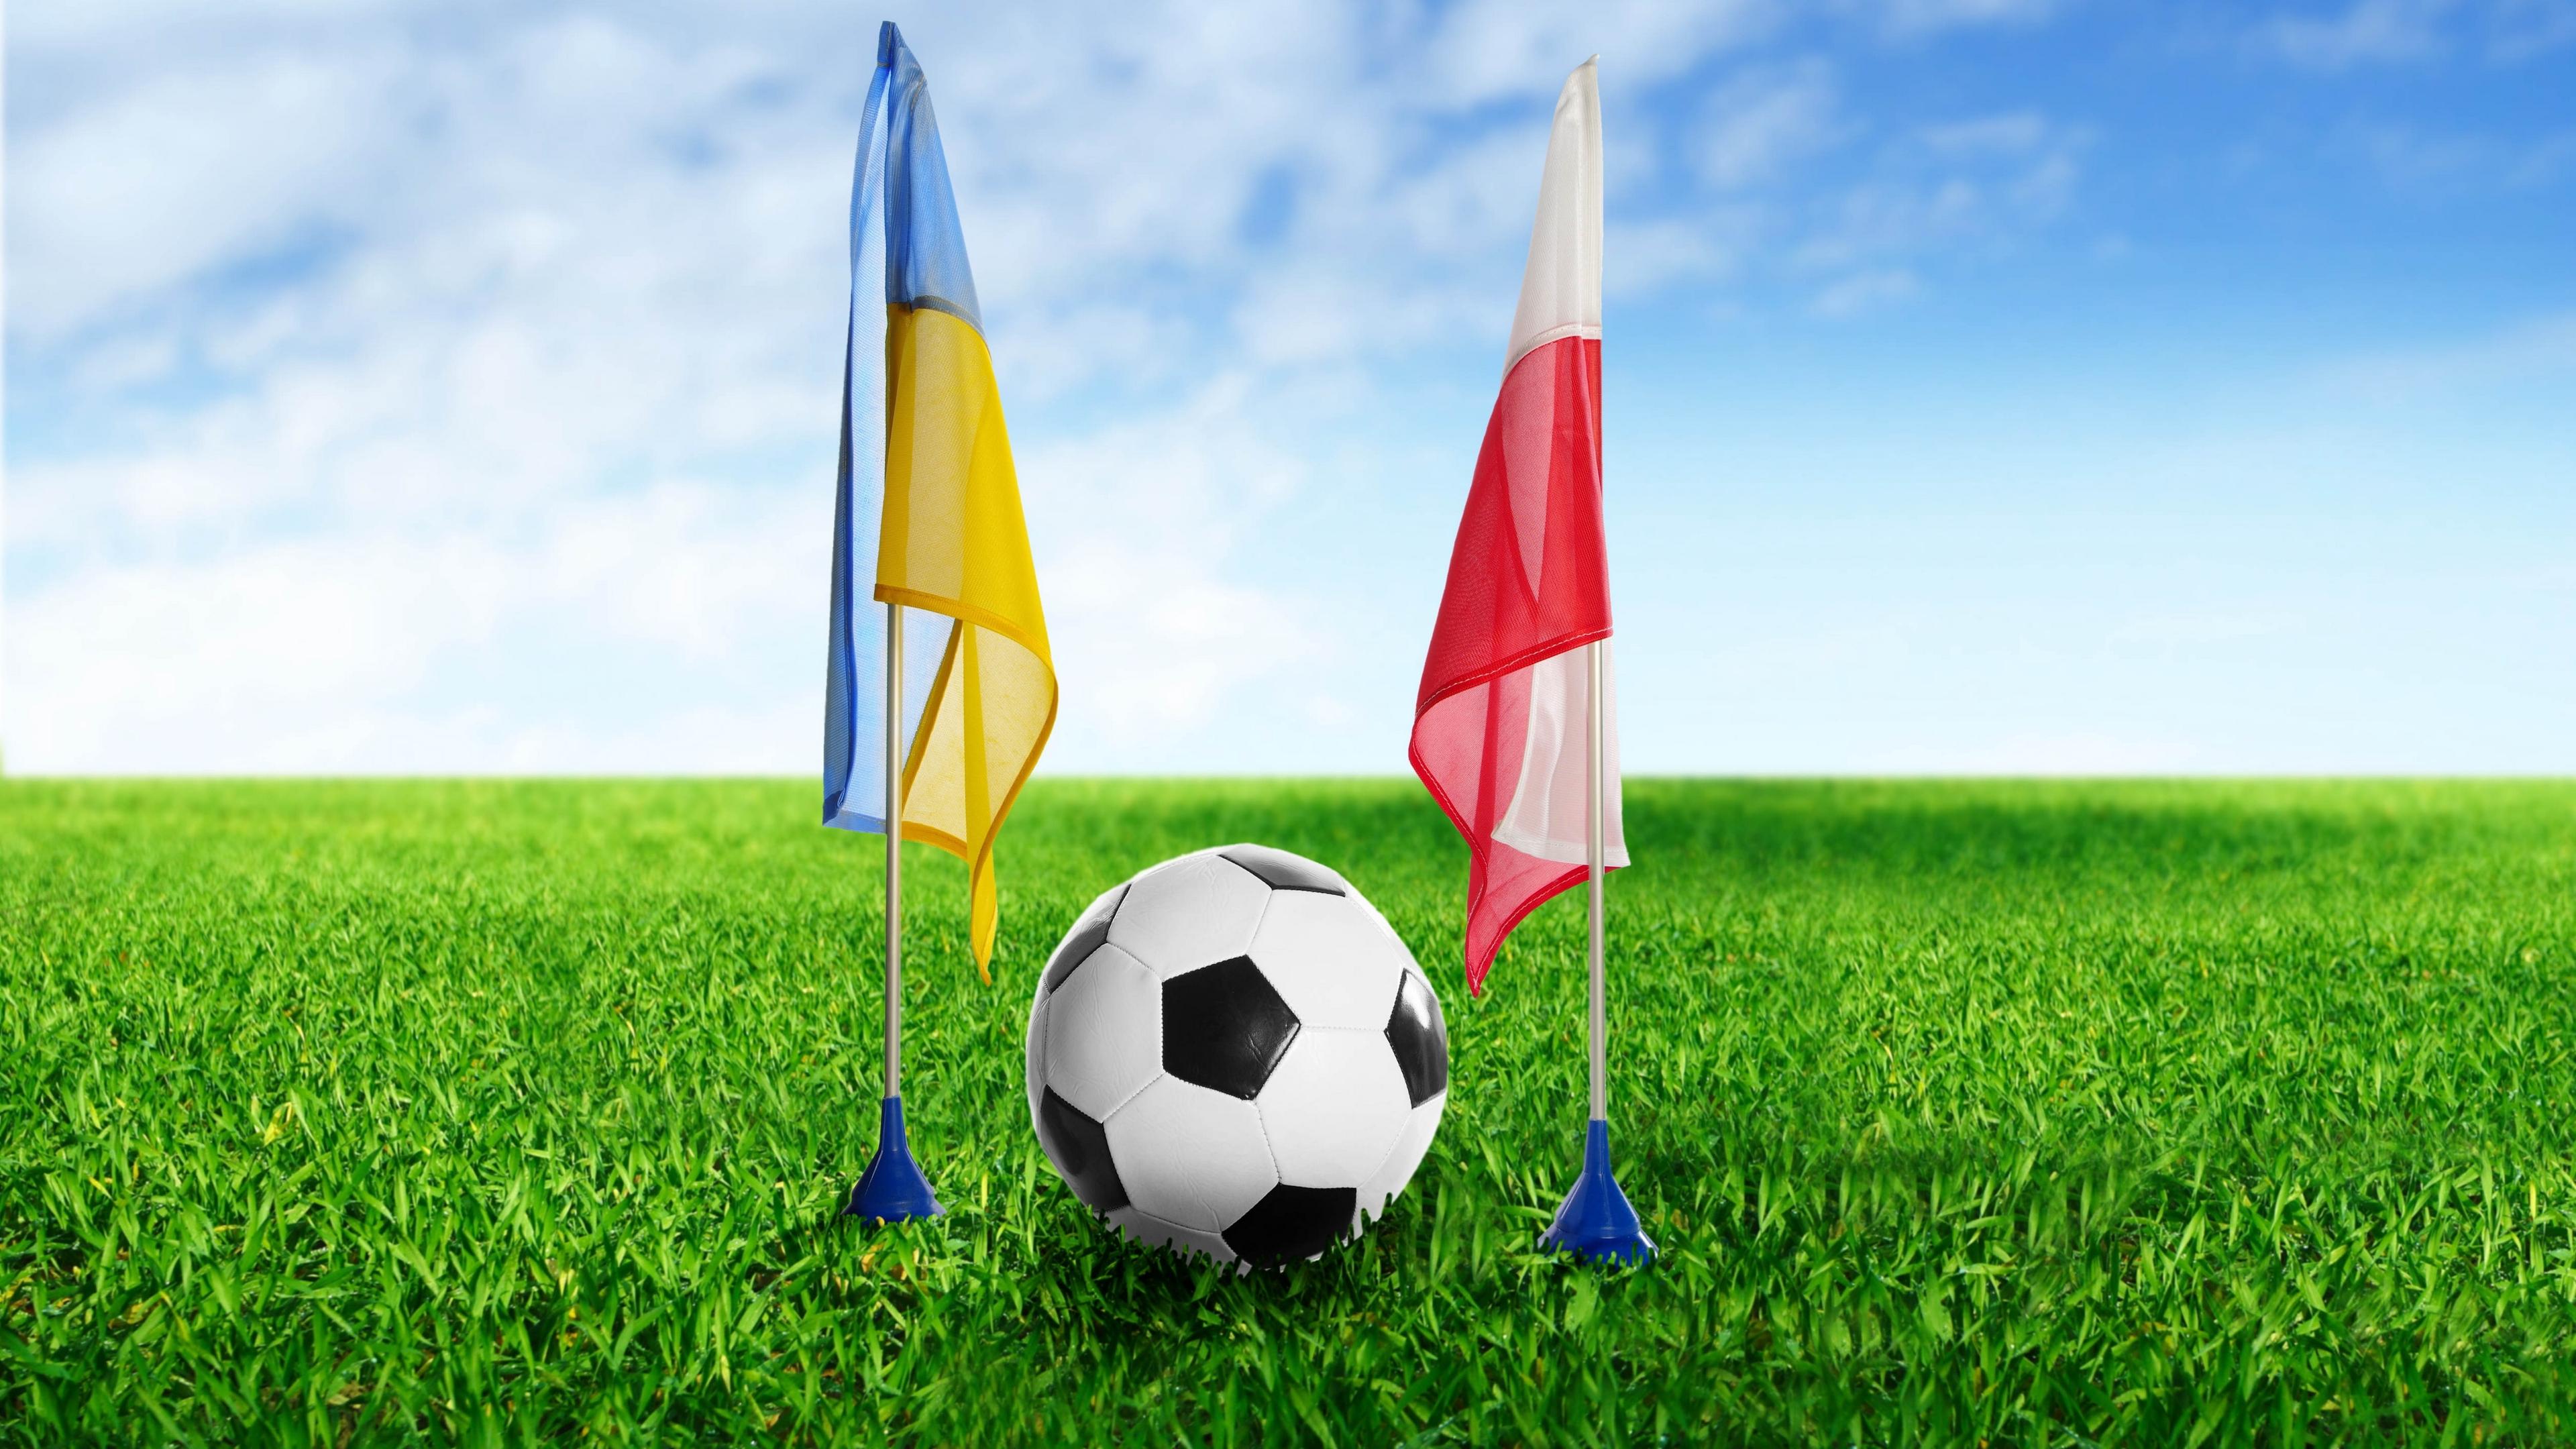 football ukraine poland ball grass flags 4k 1540062329 - football, ukraine, poland, ball, grass, flags 4k - Ukraine, Poland, Football